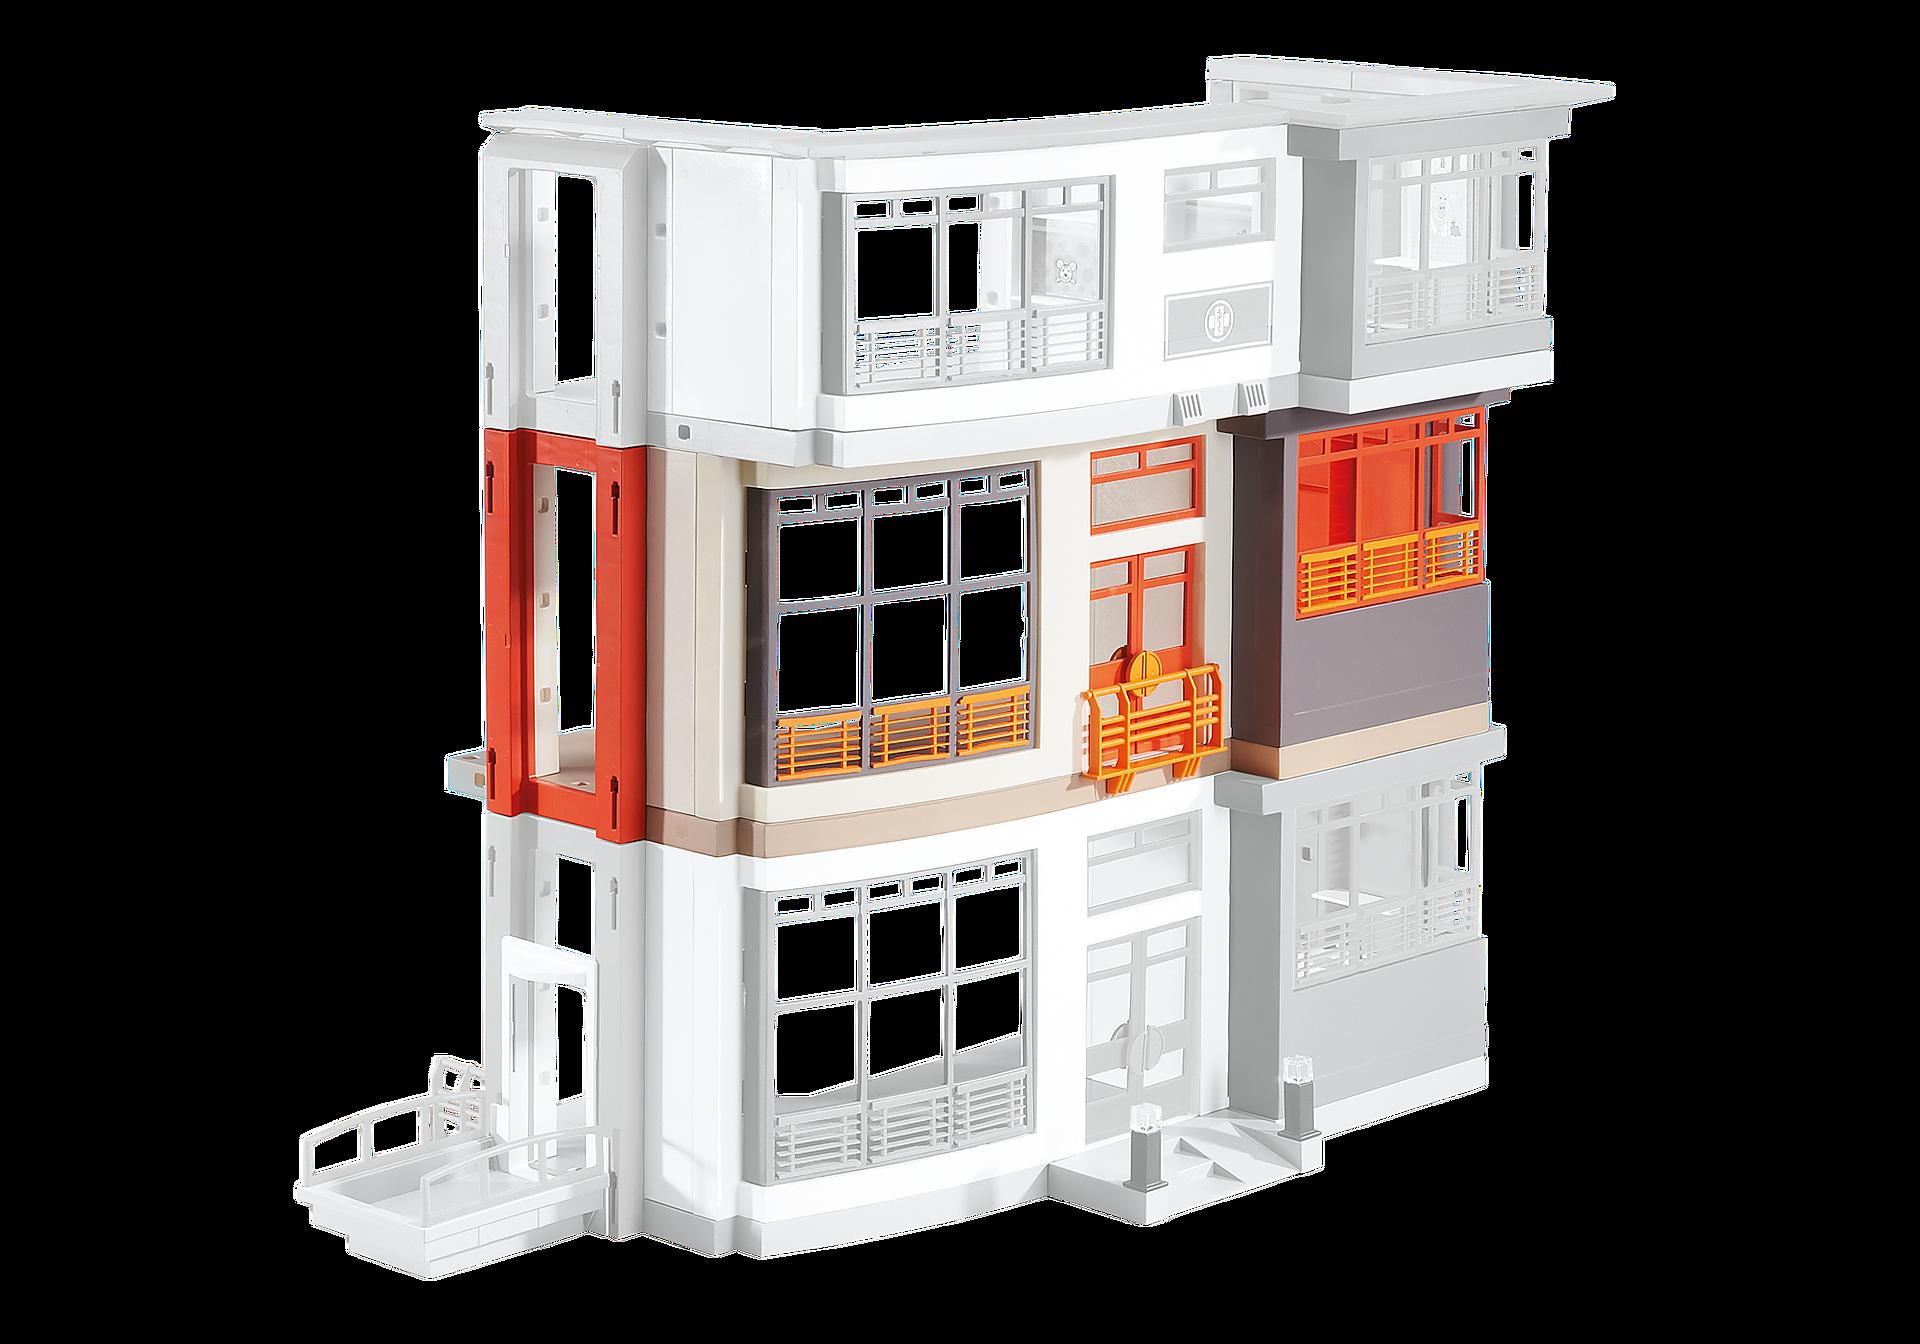 6443 Floor Extension for Furnished Children's Hospital (70190) zoom image1